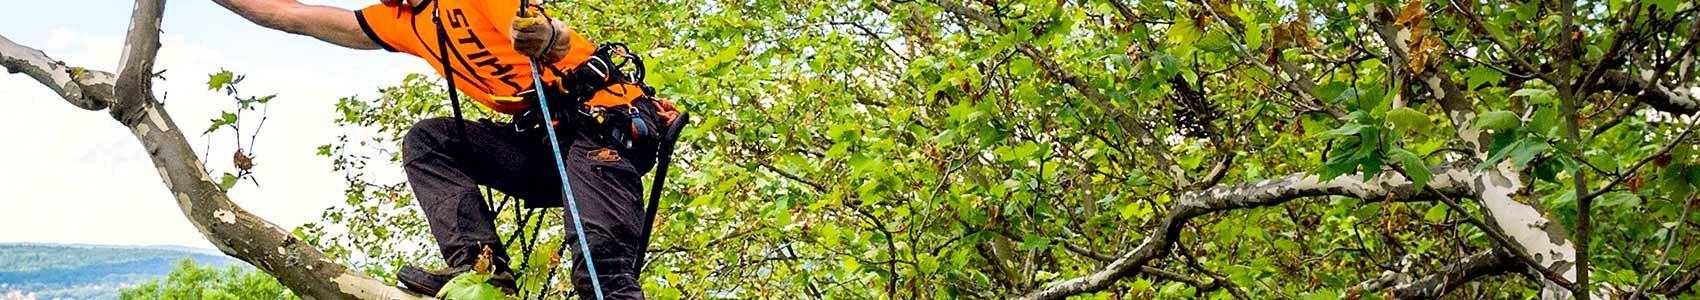 TreeClimbing Corde